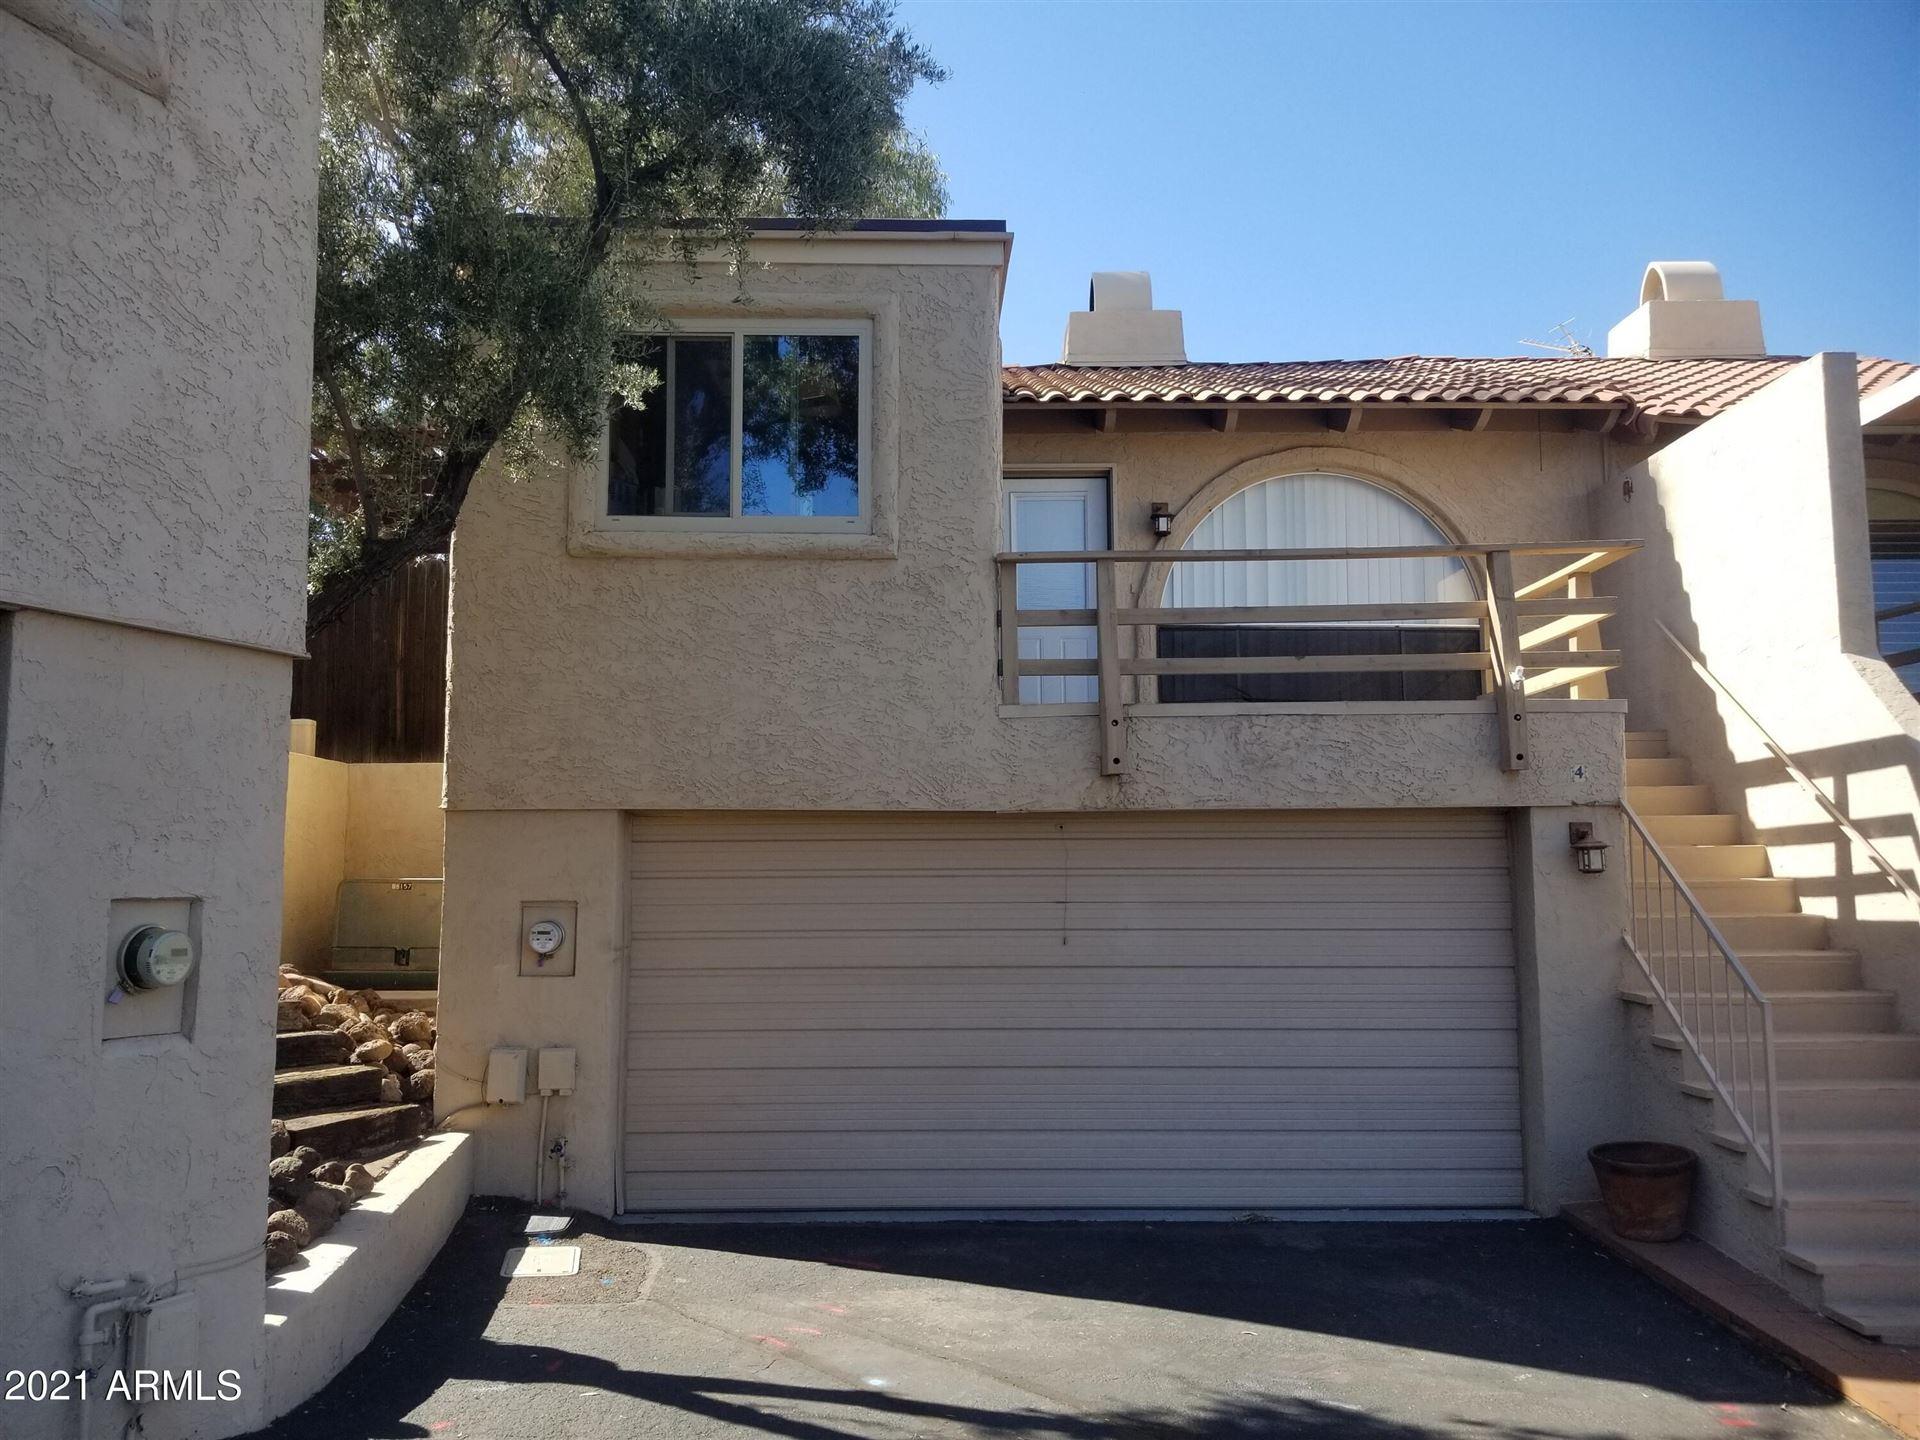 Photo of 7501 E HAPPY HOLLOW Drive #4, Carefree, AZ 85377 (MLS # 6222561)